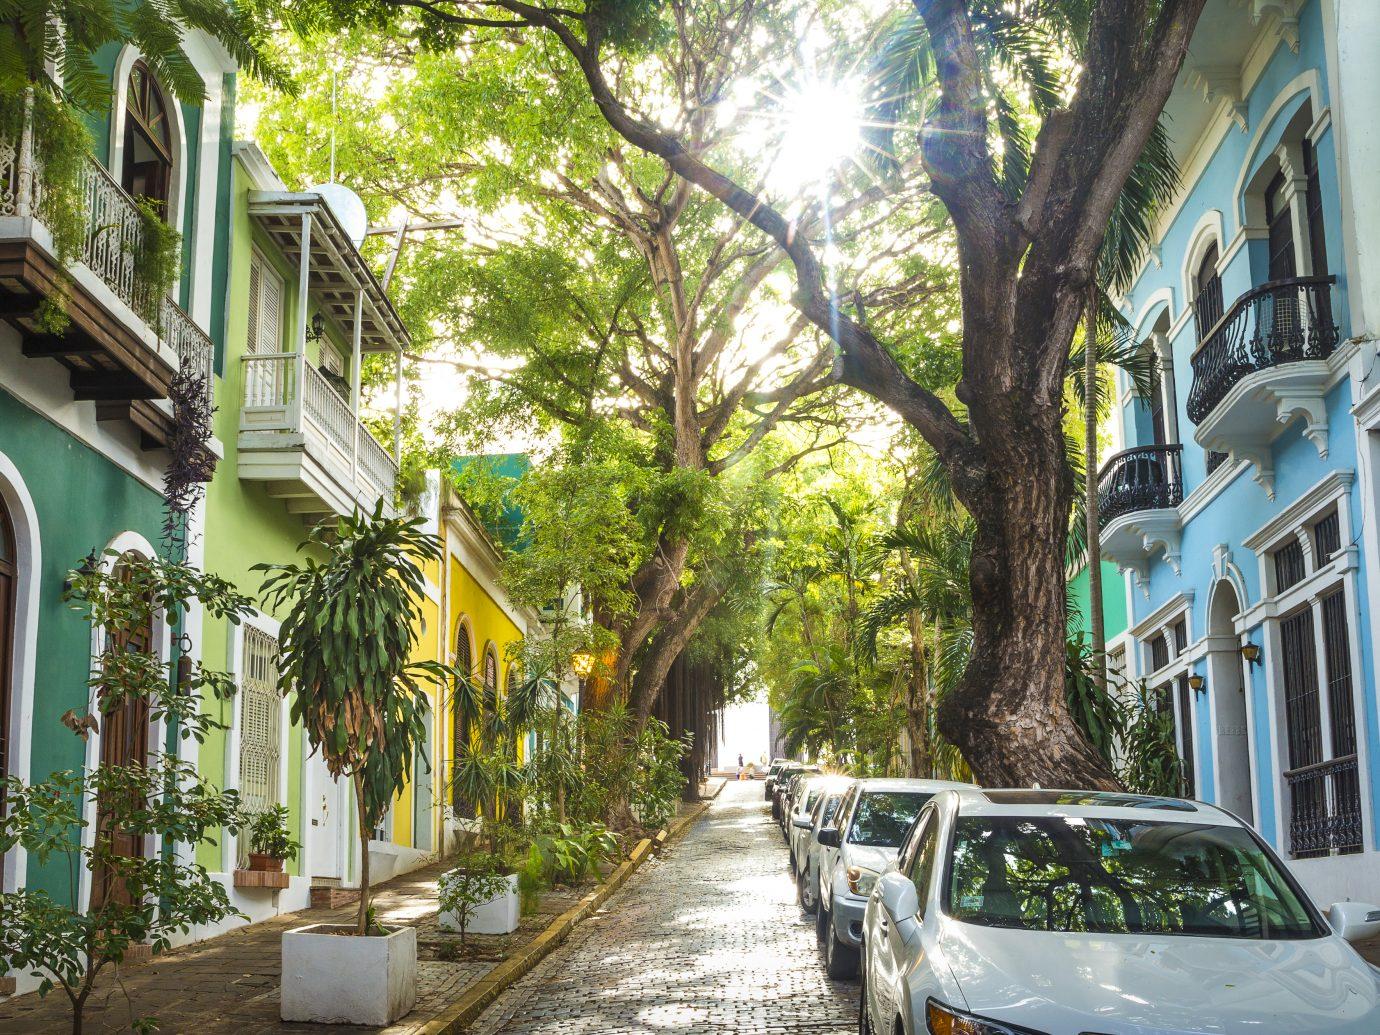 Panoramic photo of Old San Juan street in Puerto Rico